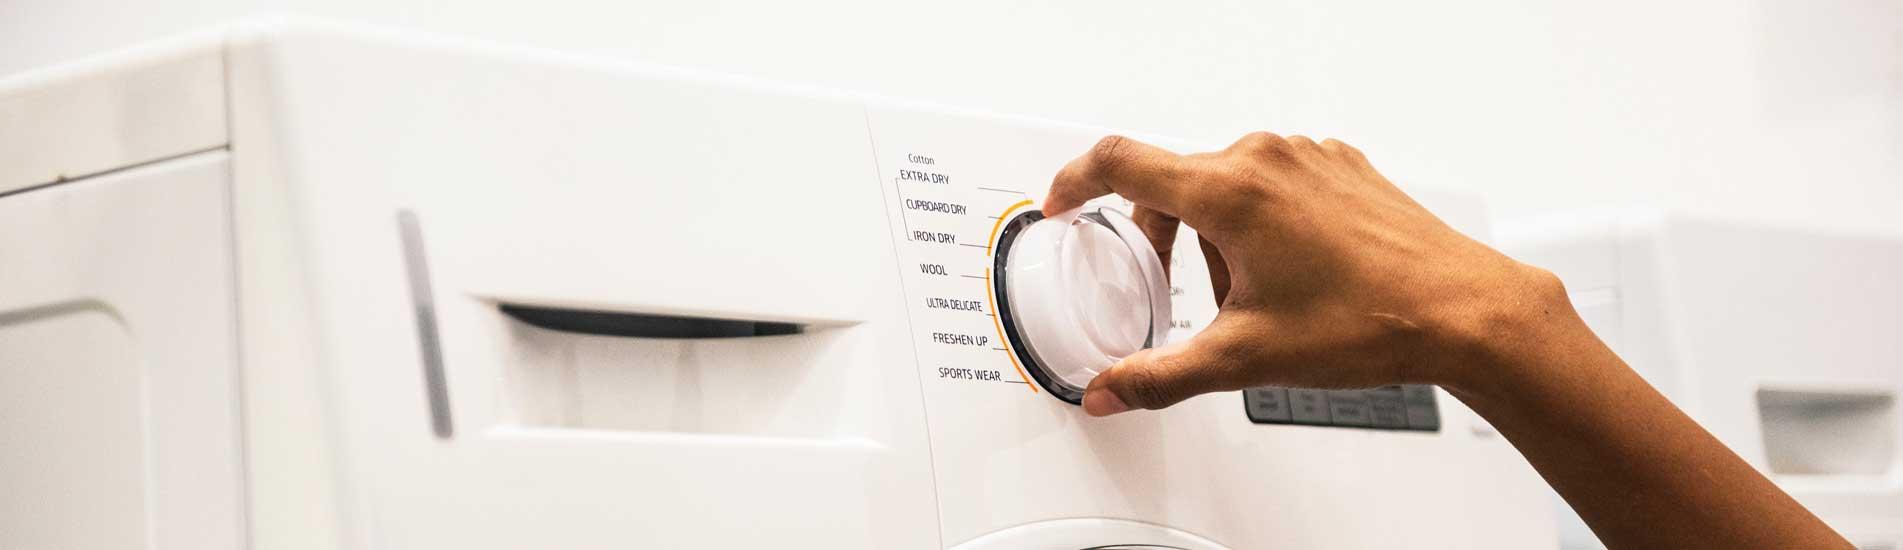 Person Turning Washer Knob